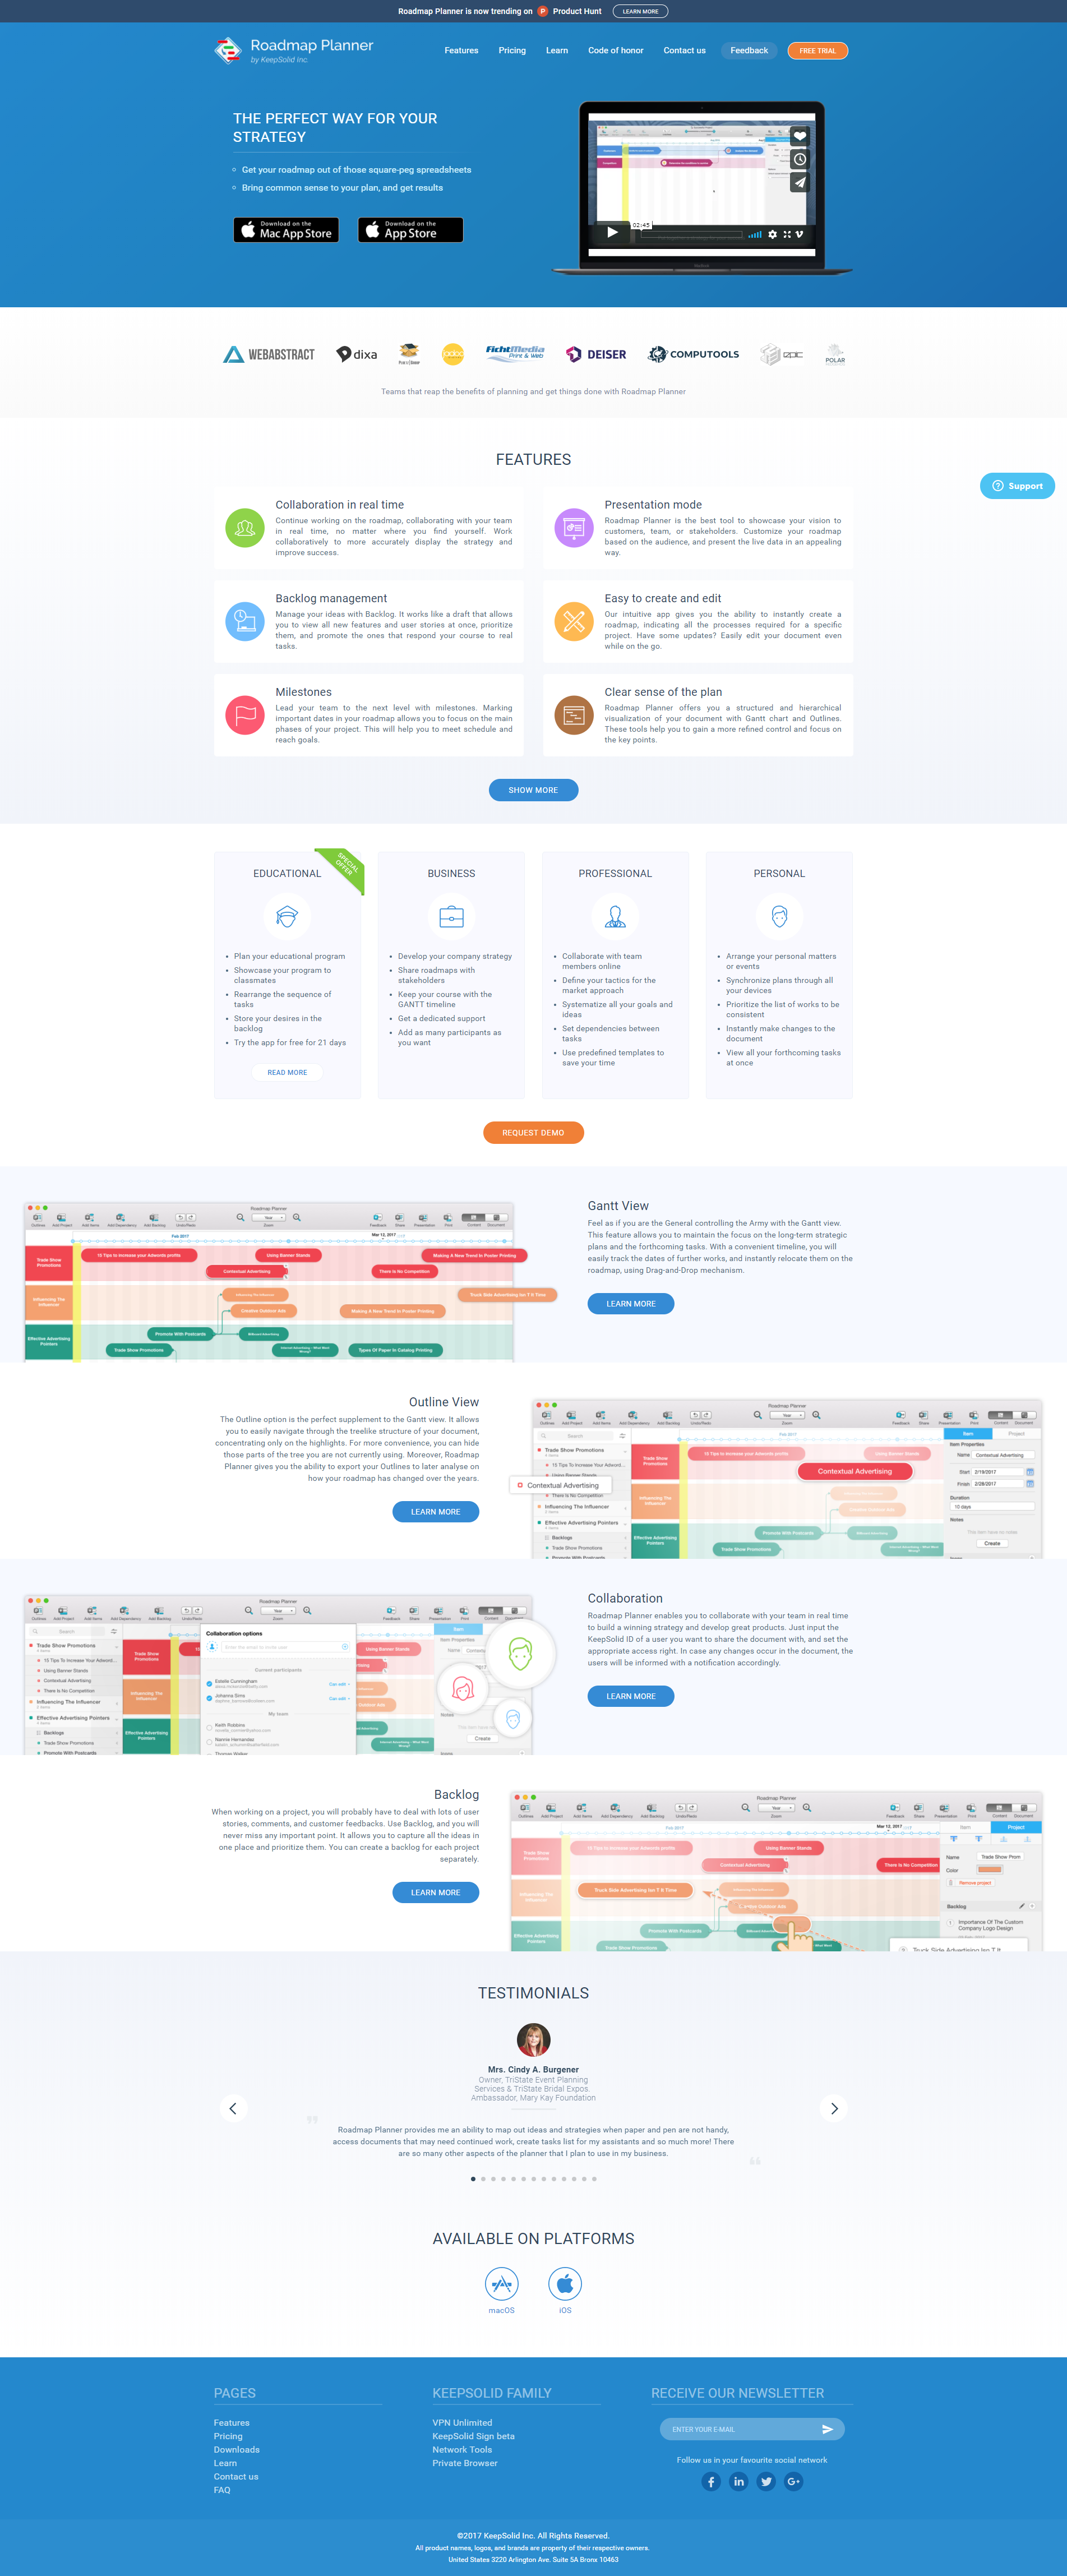 Roadmapplannerio Home Web Design Pinterest - Roadmap planner